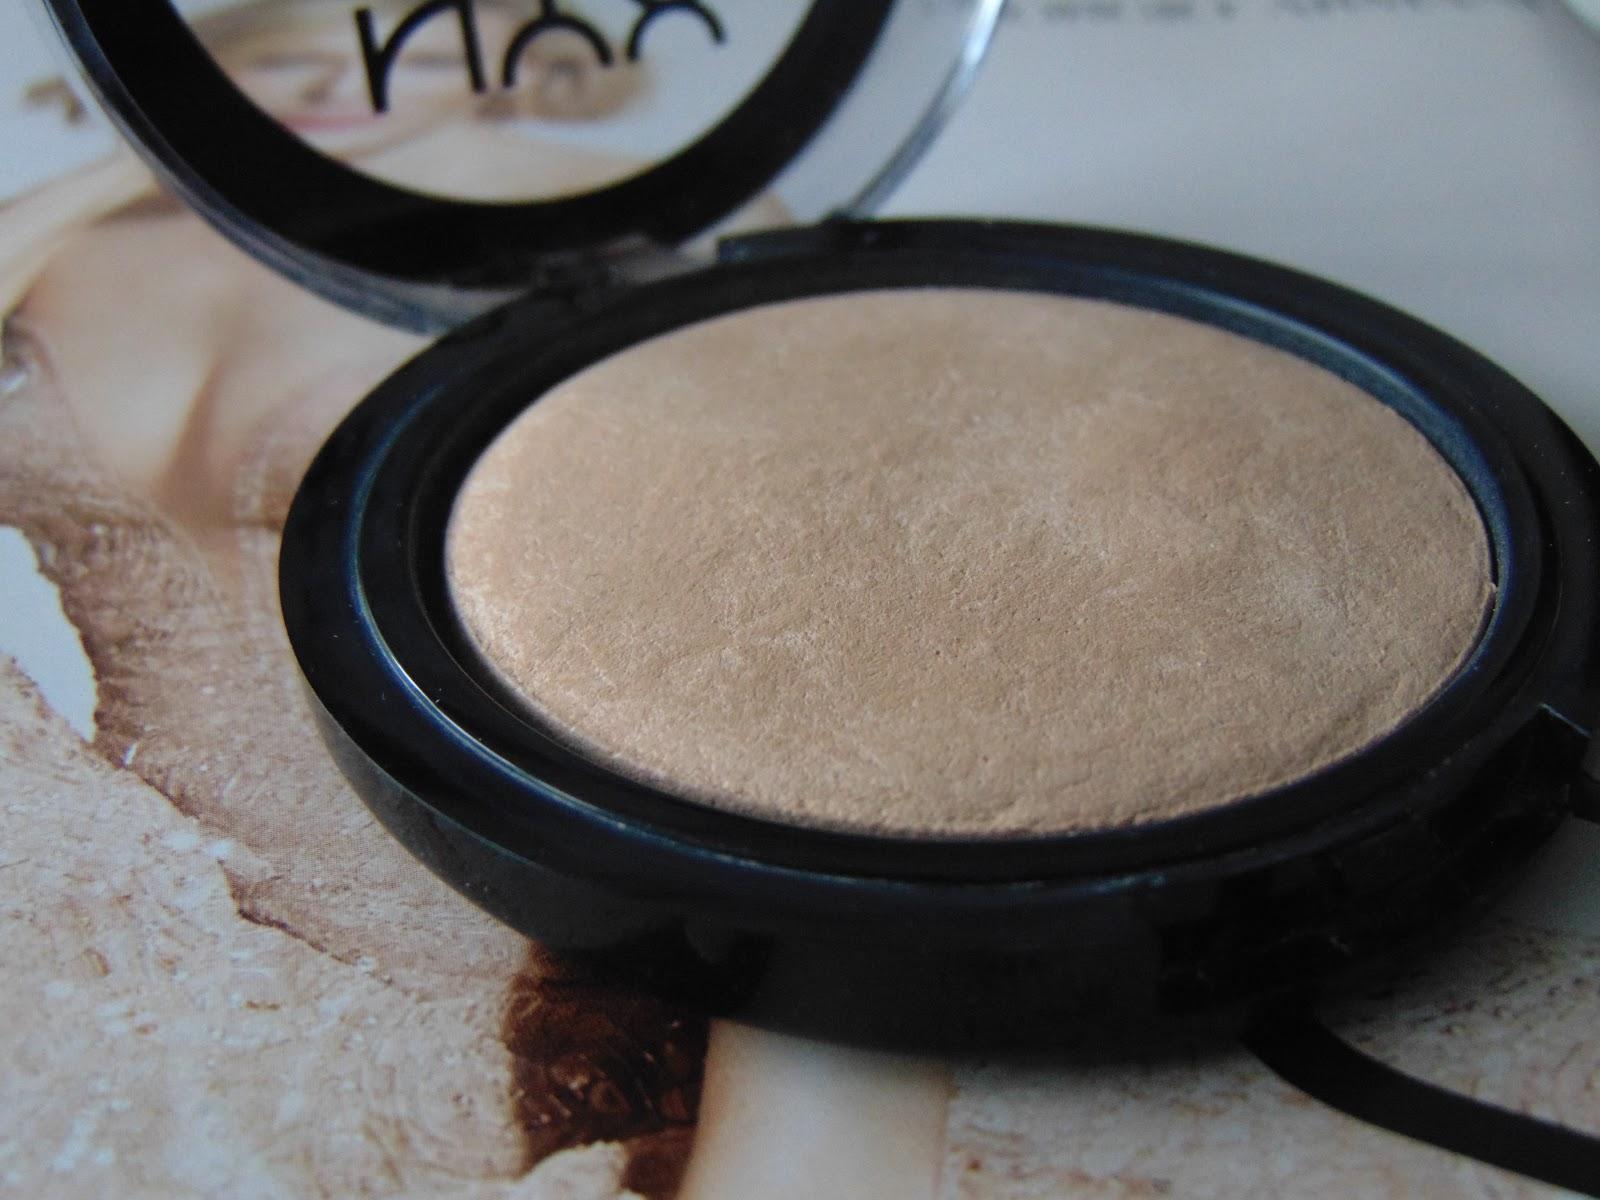 NYX #NOFILTRE finishing powder